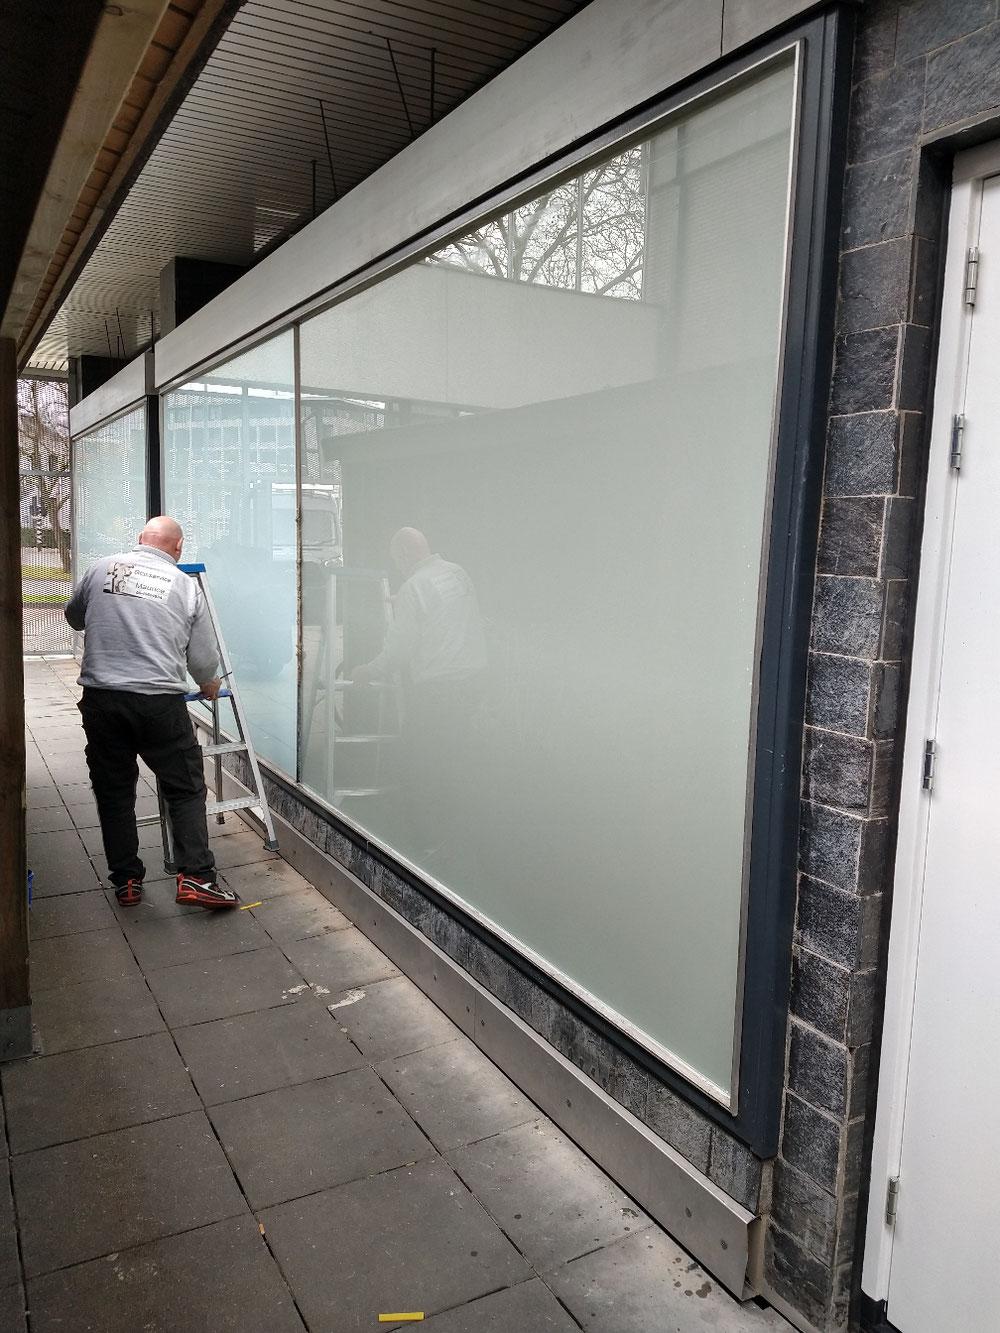 Veiligheid glas matte folie geplaatst